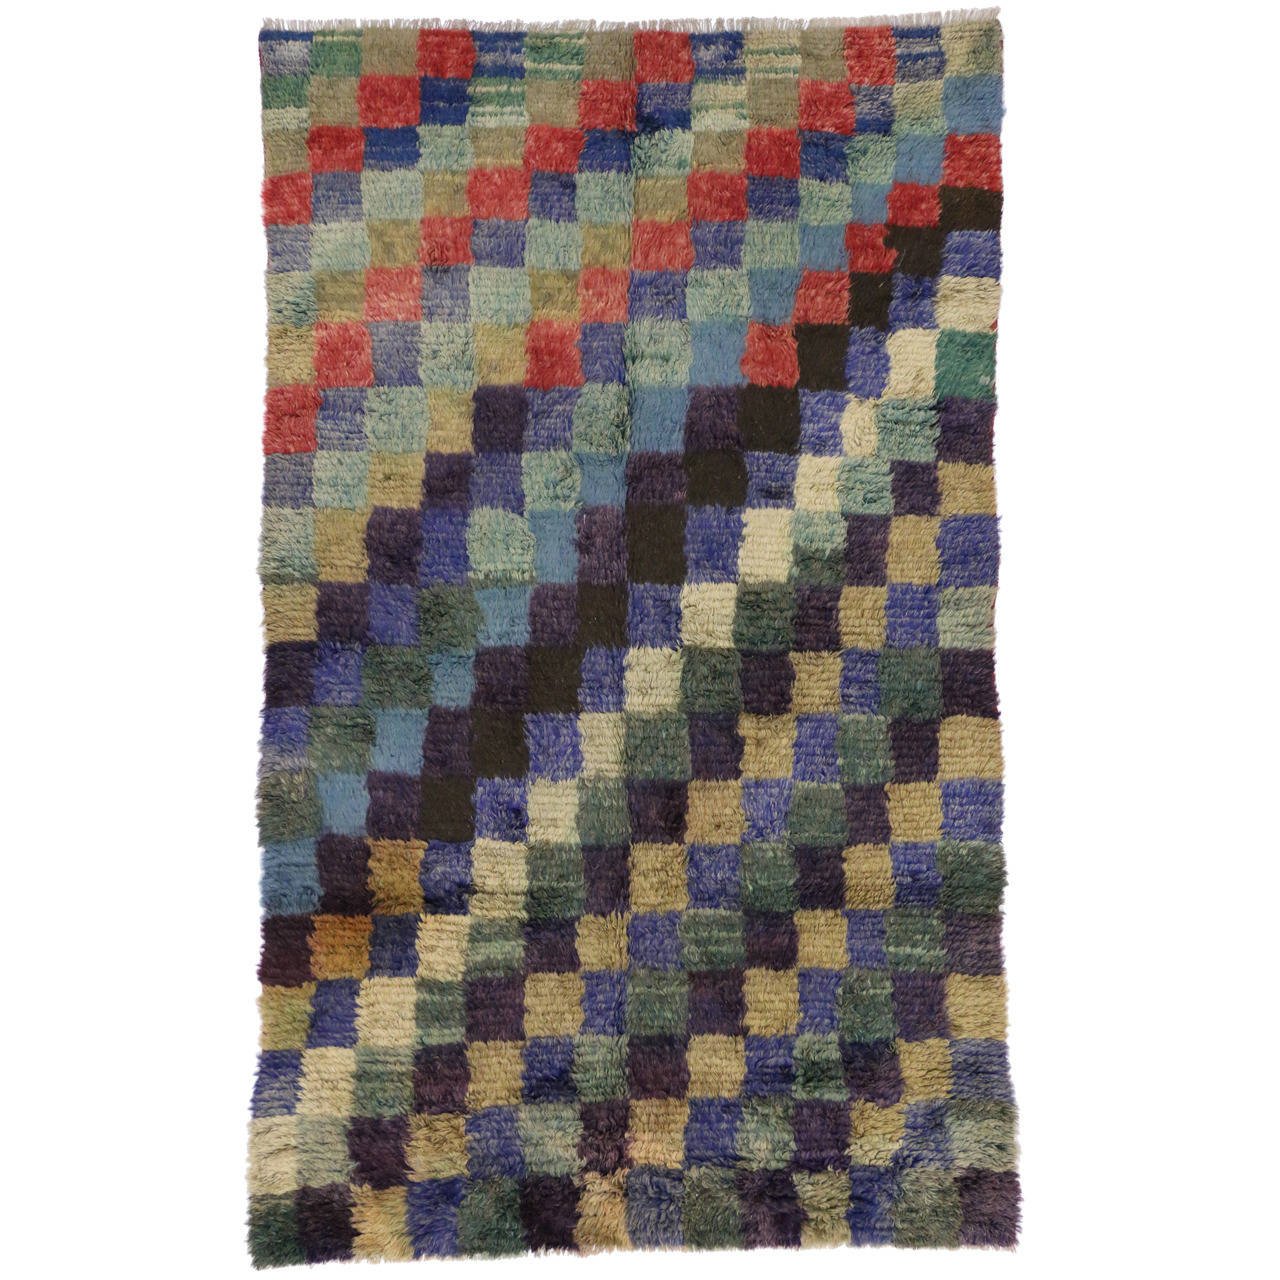 checkered vintage turkish tulu rug with midcentury modern style  - checkered vintage turkish tulu rug with midcentury modern style